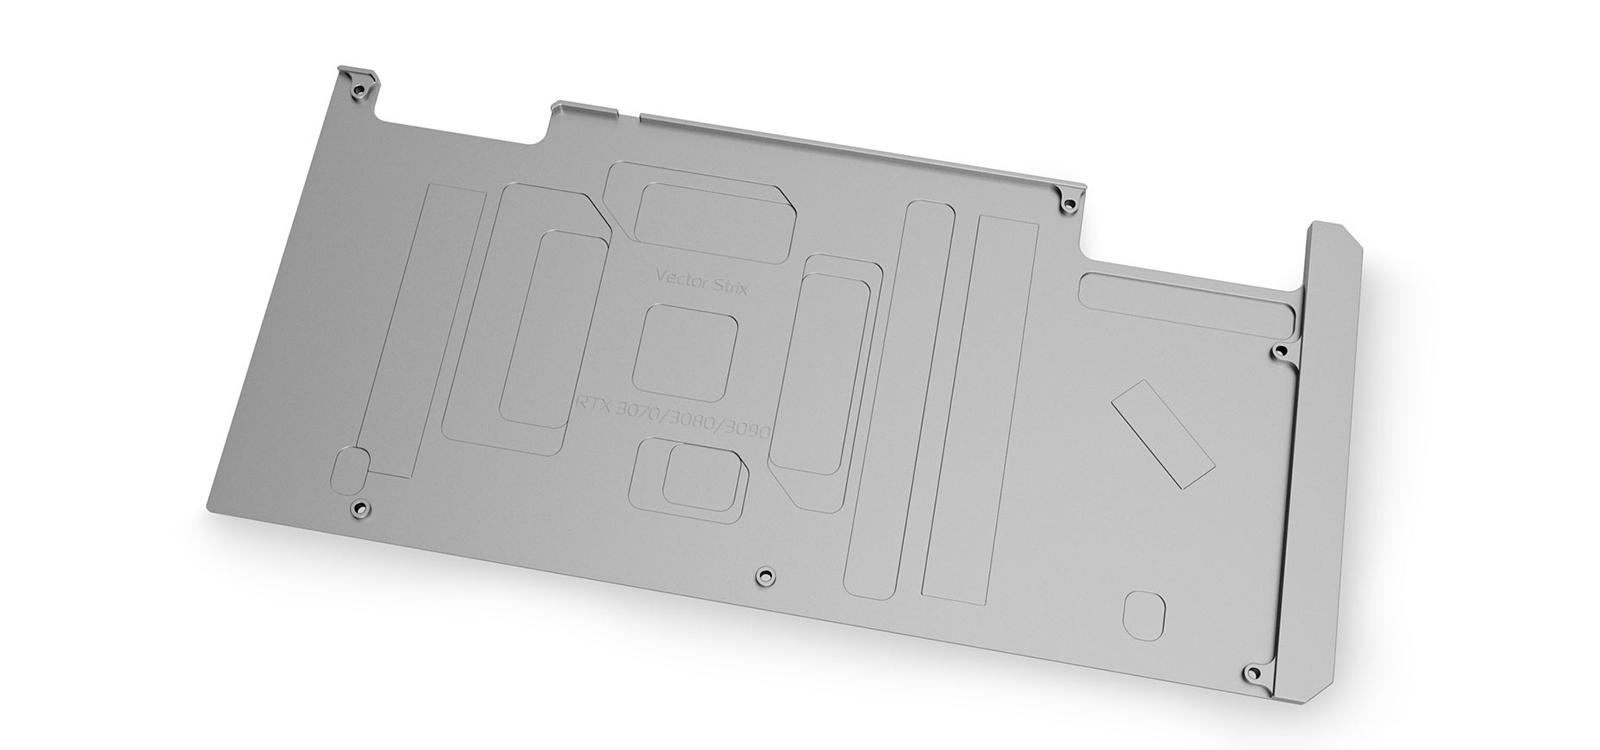 EK-Quantum Vector Strix RTX 3070/3080/3090 Backplate - Nickel2